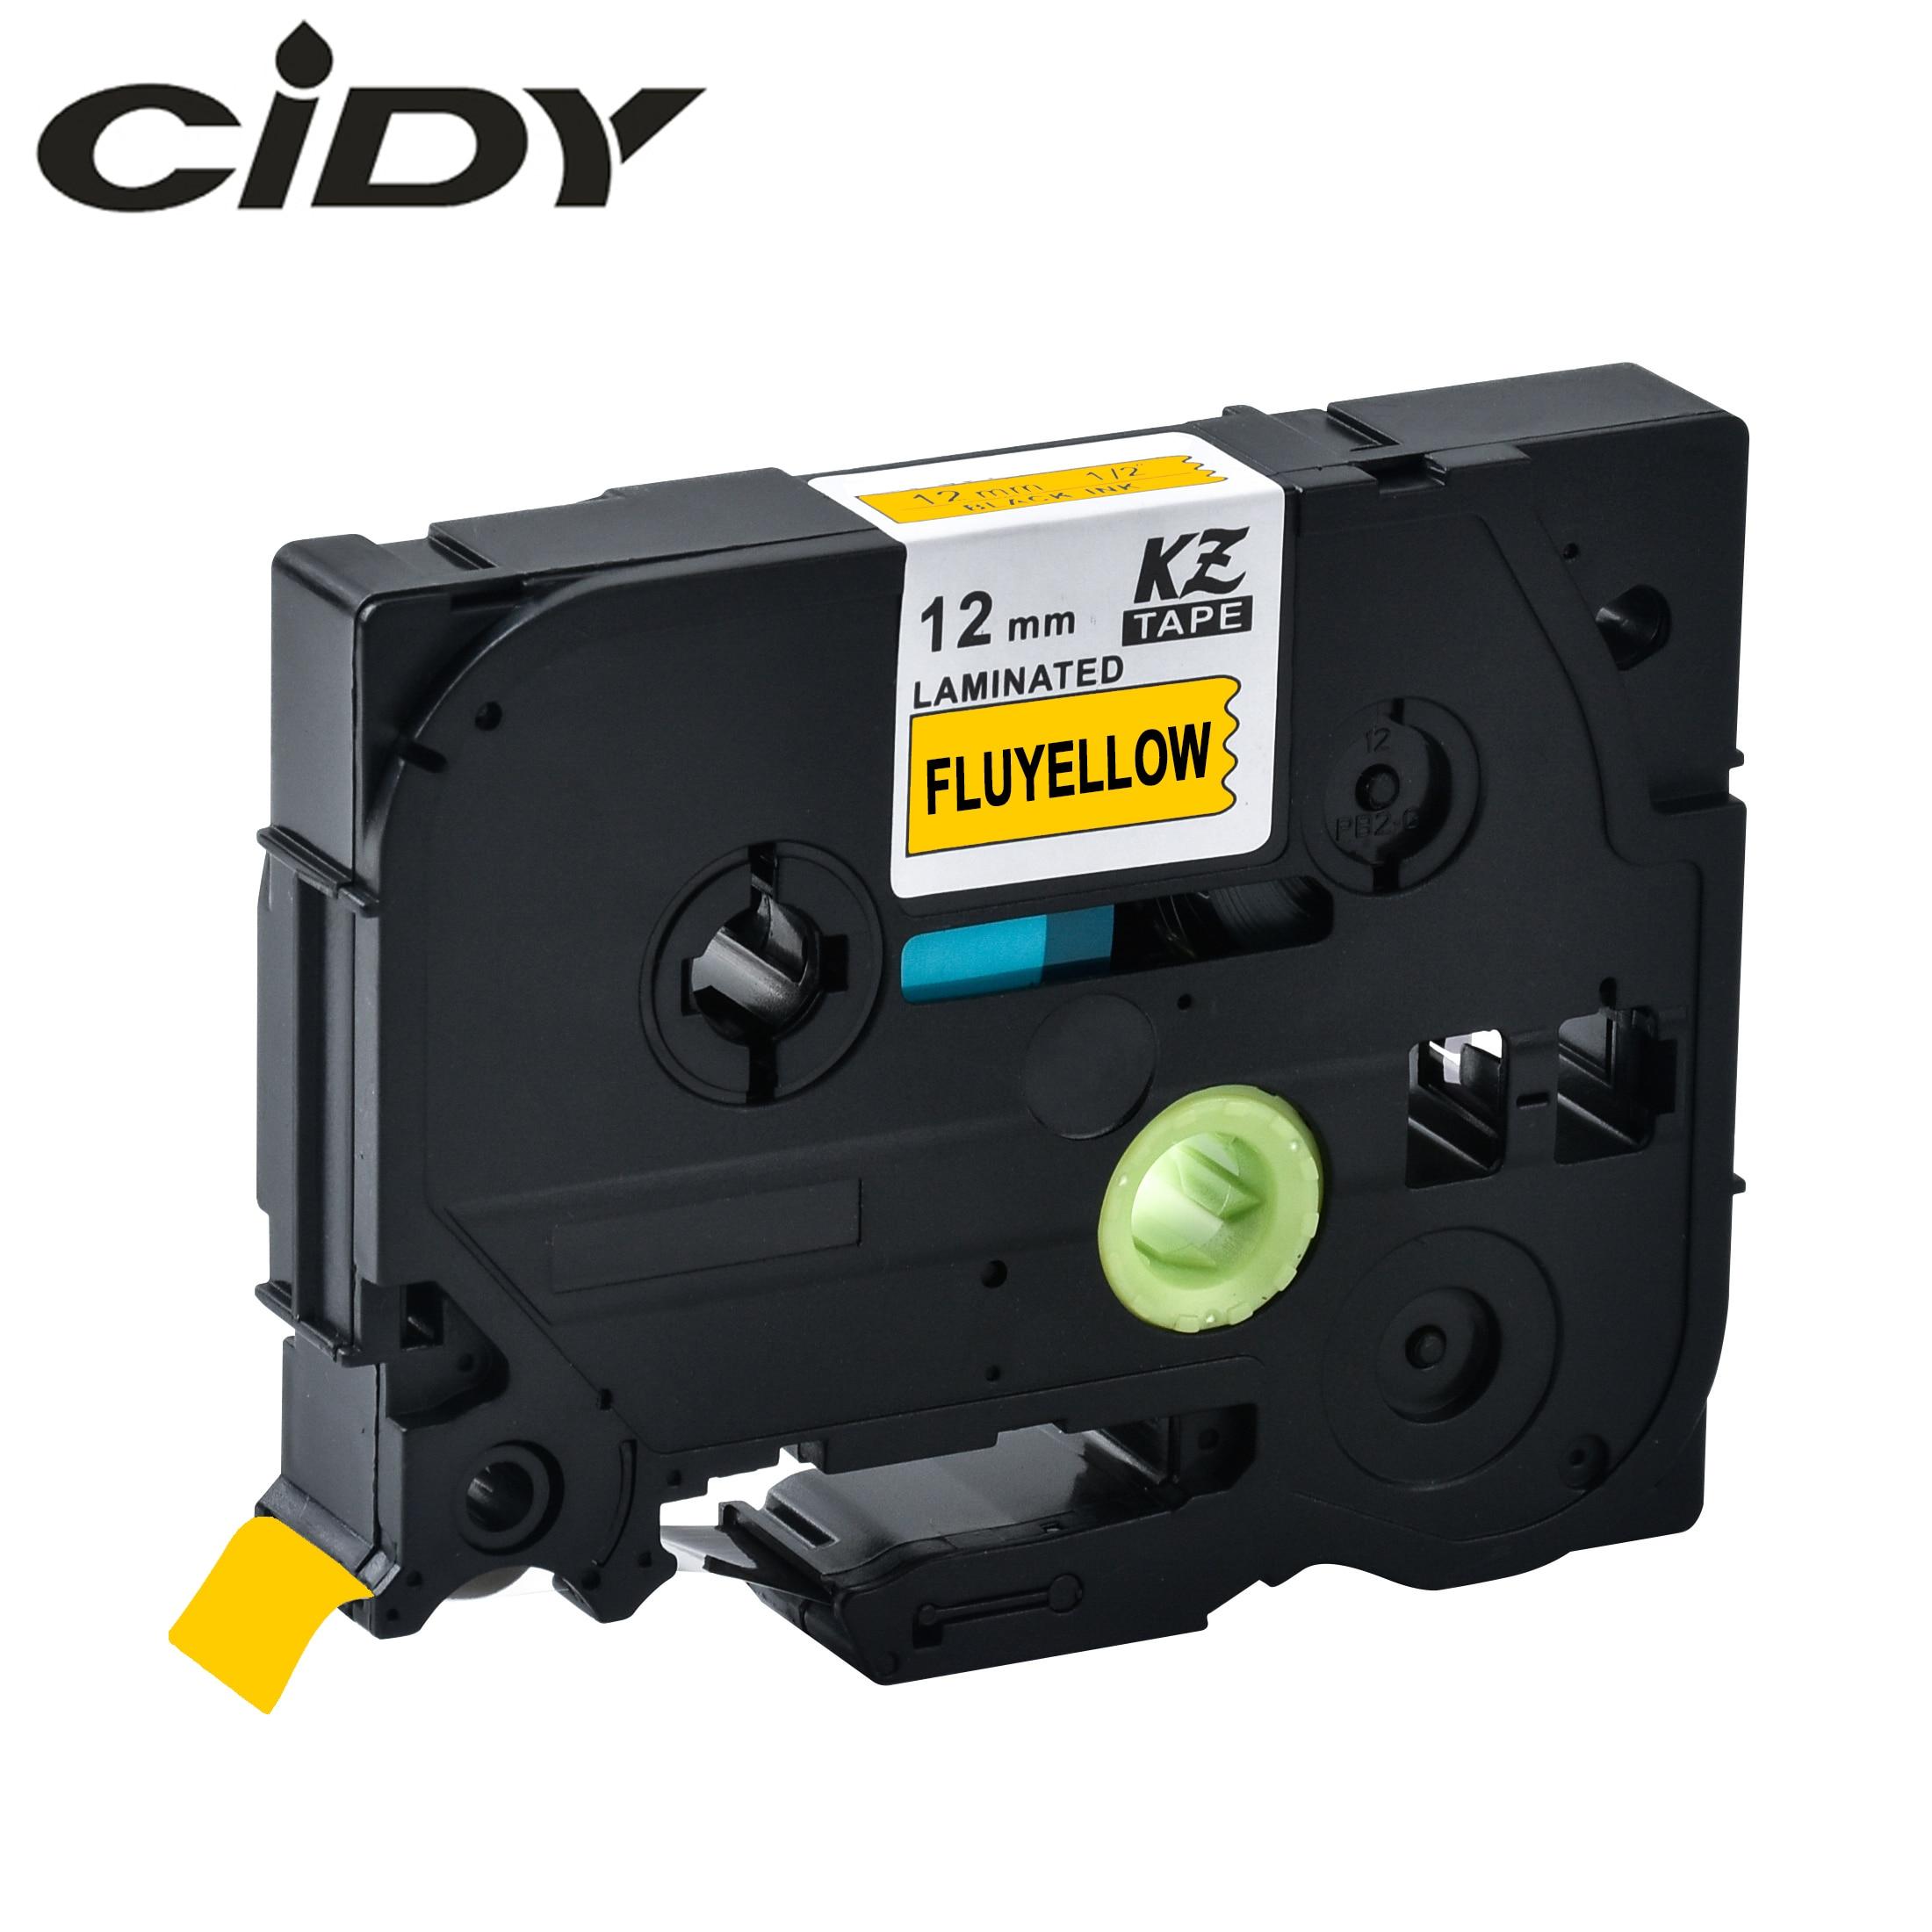 CIDY Tze-C31 Tz-C31 Black On Fluorescent Yellow Laminated Compatible Brother P Touch 12mm Tze C31 TZ C31 Label Cassette Ribbon